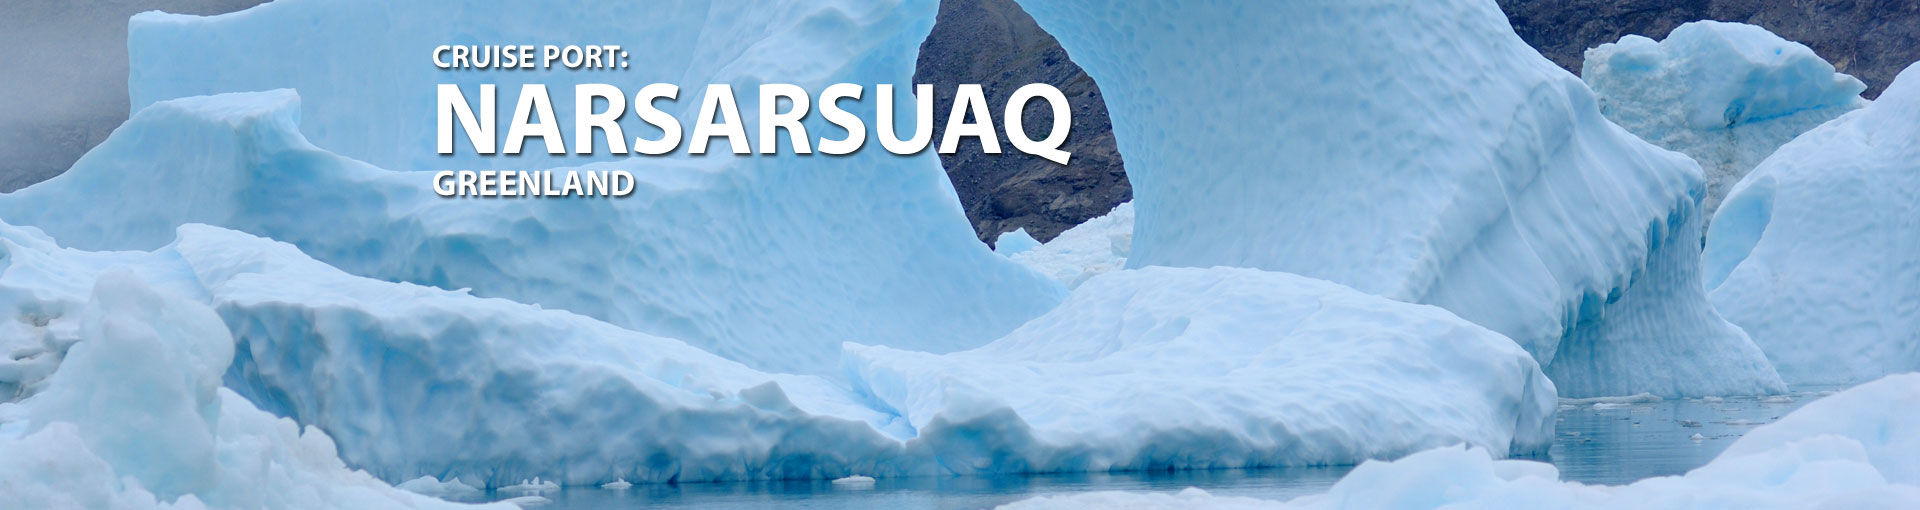 Cruises to Narsarsuaq, Greenland